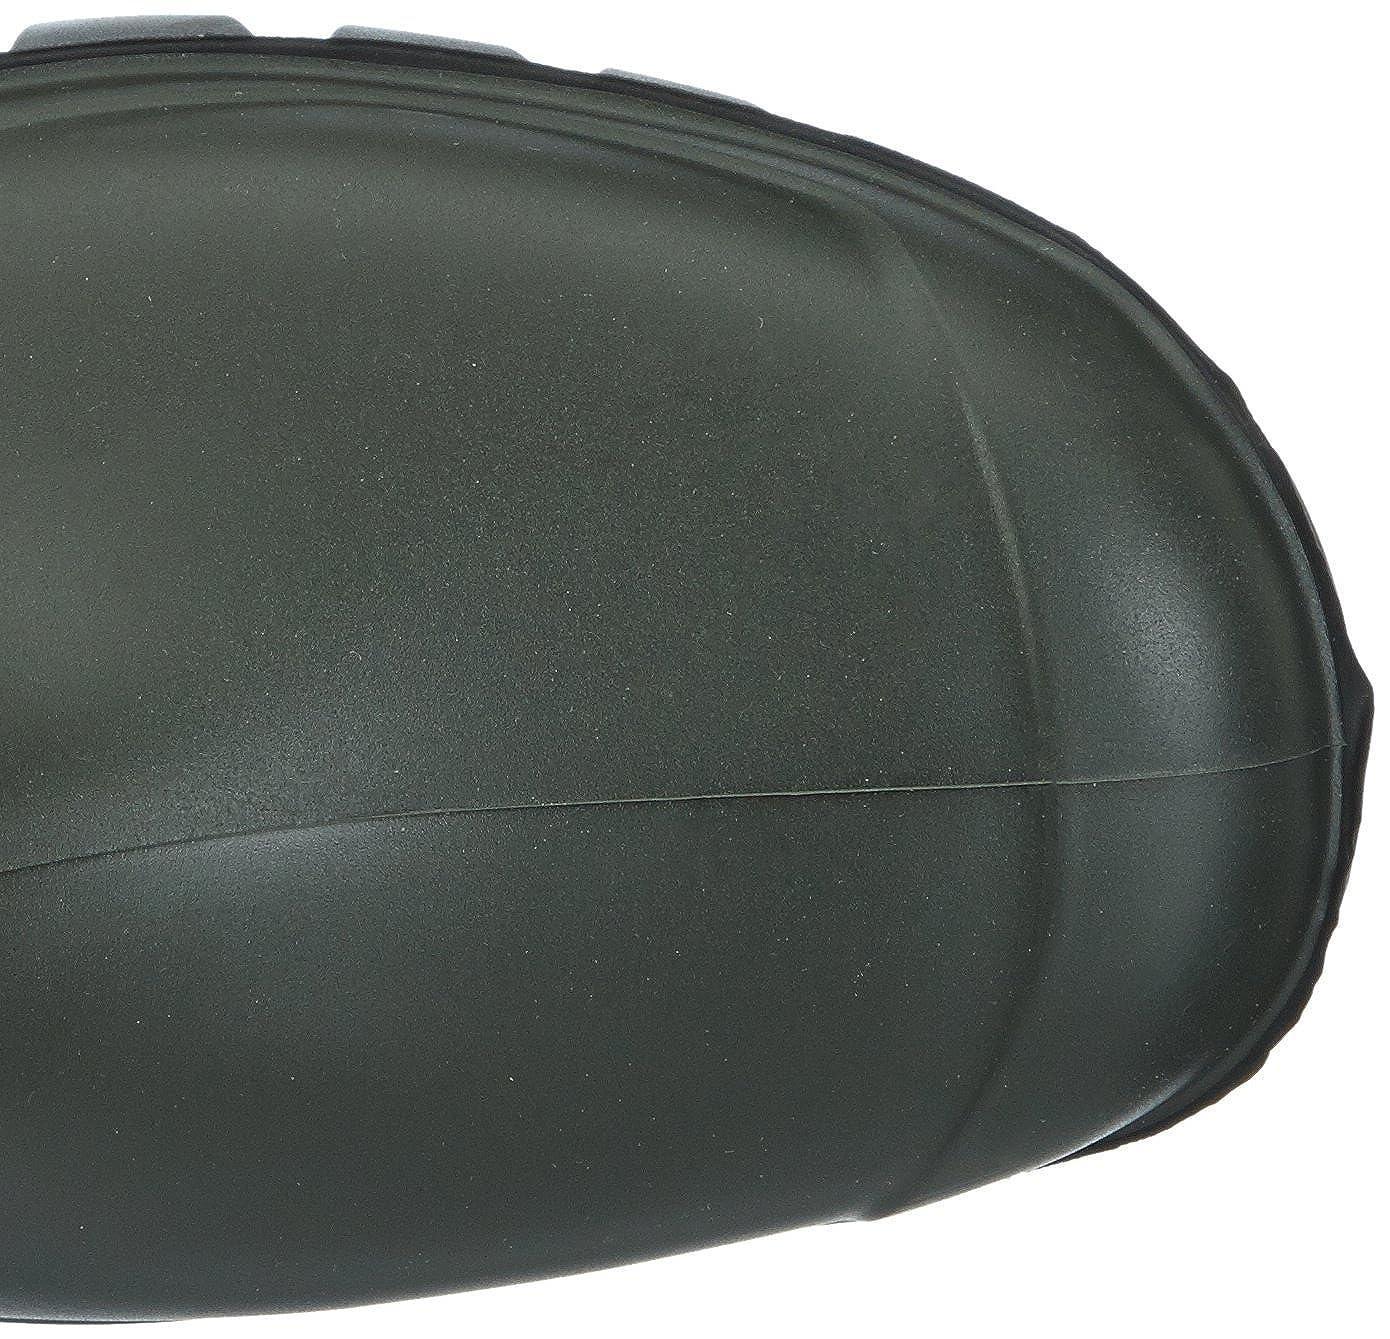 Dunlop Stivali professionali Dee comodi ed eleganti senza puntale in acciaio K580011